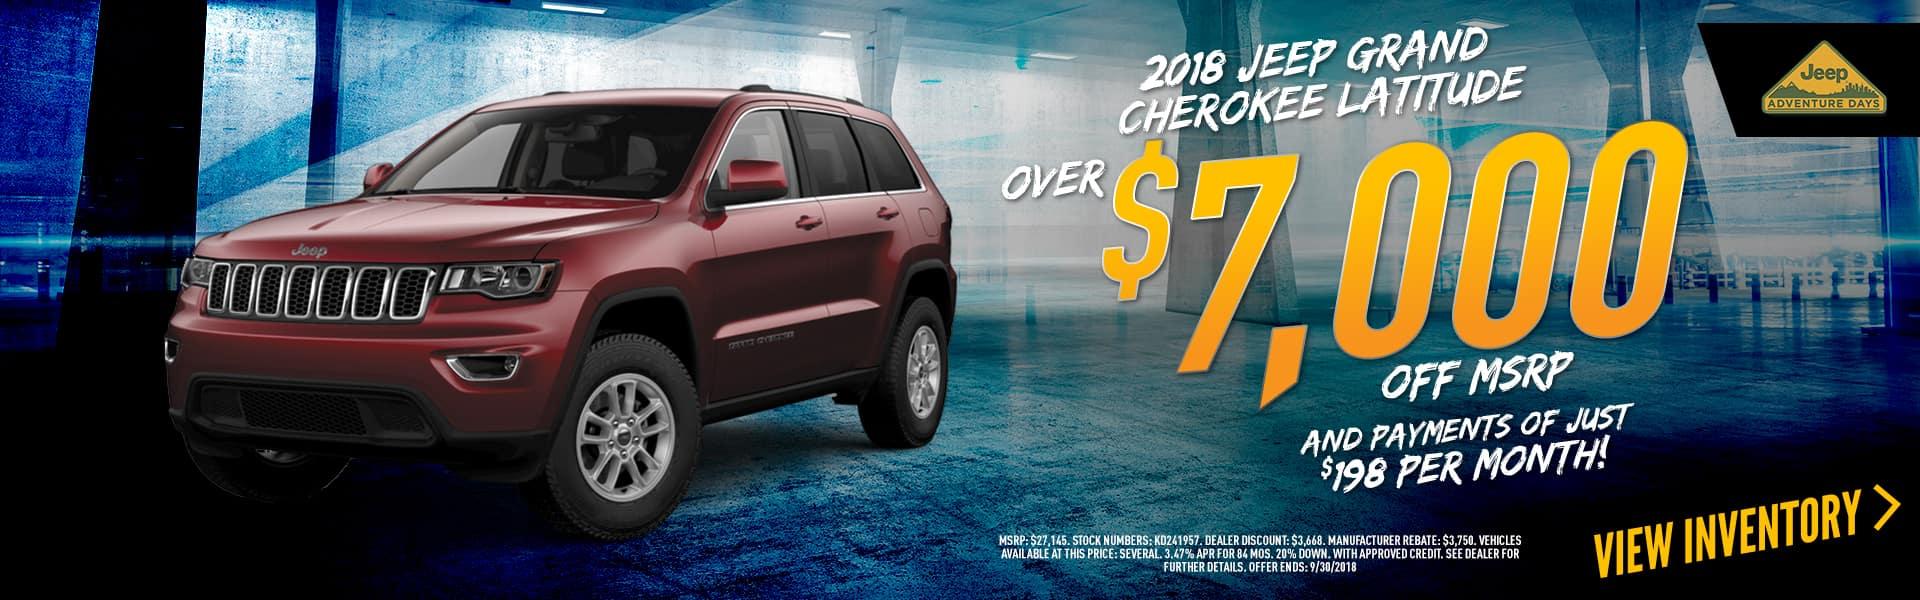 2018-jeep-grand-cherokee-latitude